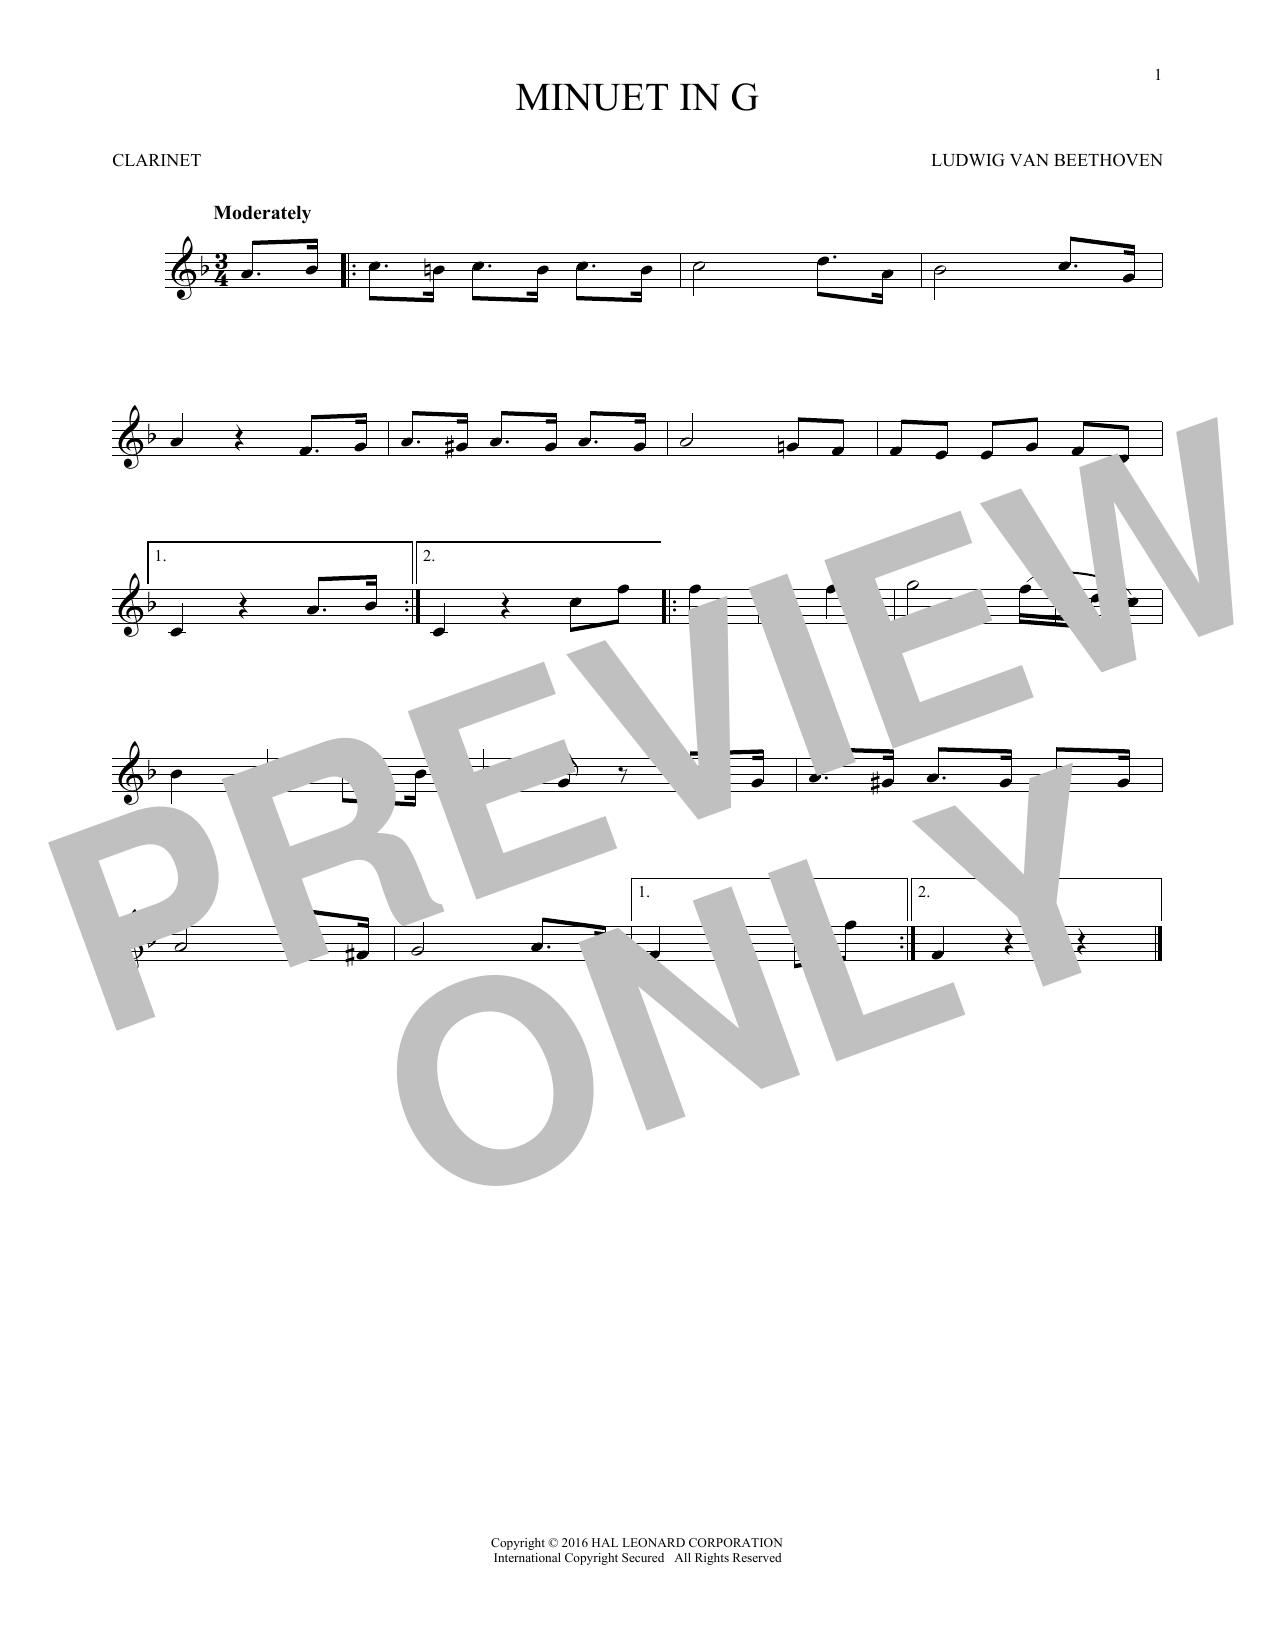 Minuet In G (Clarinet Solo)